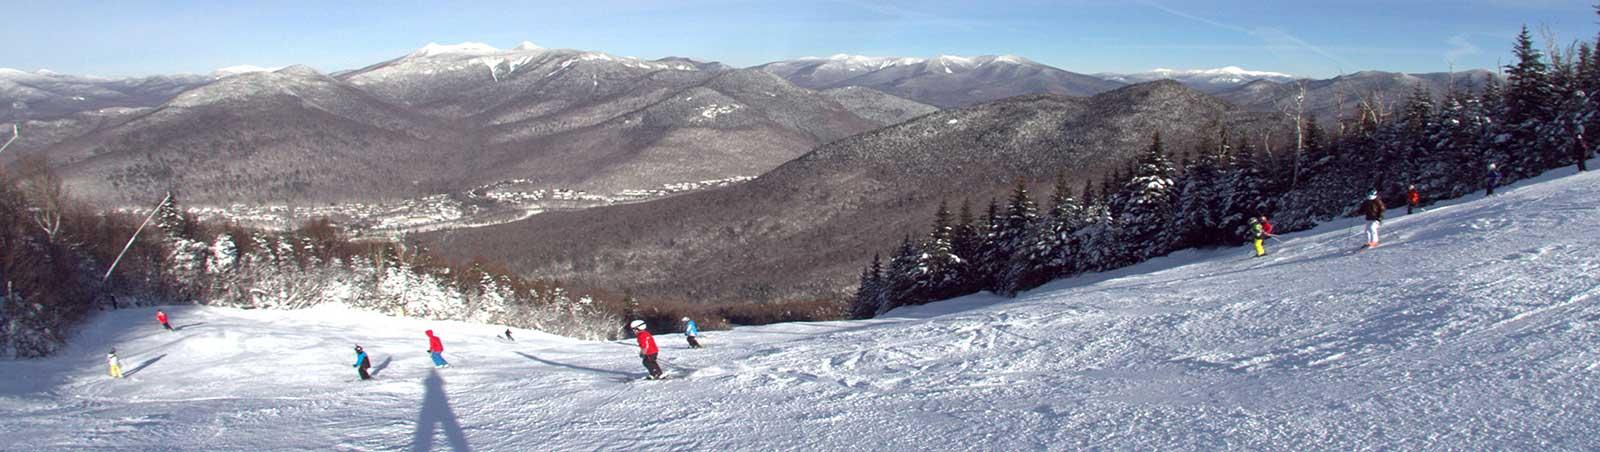 Loon Valley Skiing, New Hampshire, inspireski